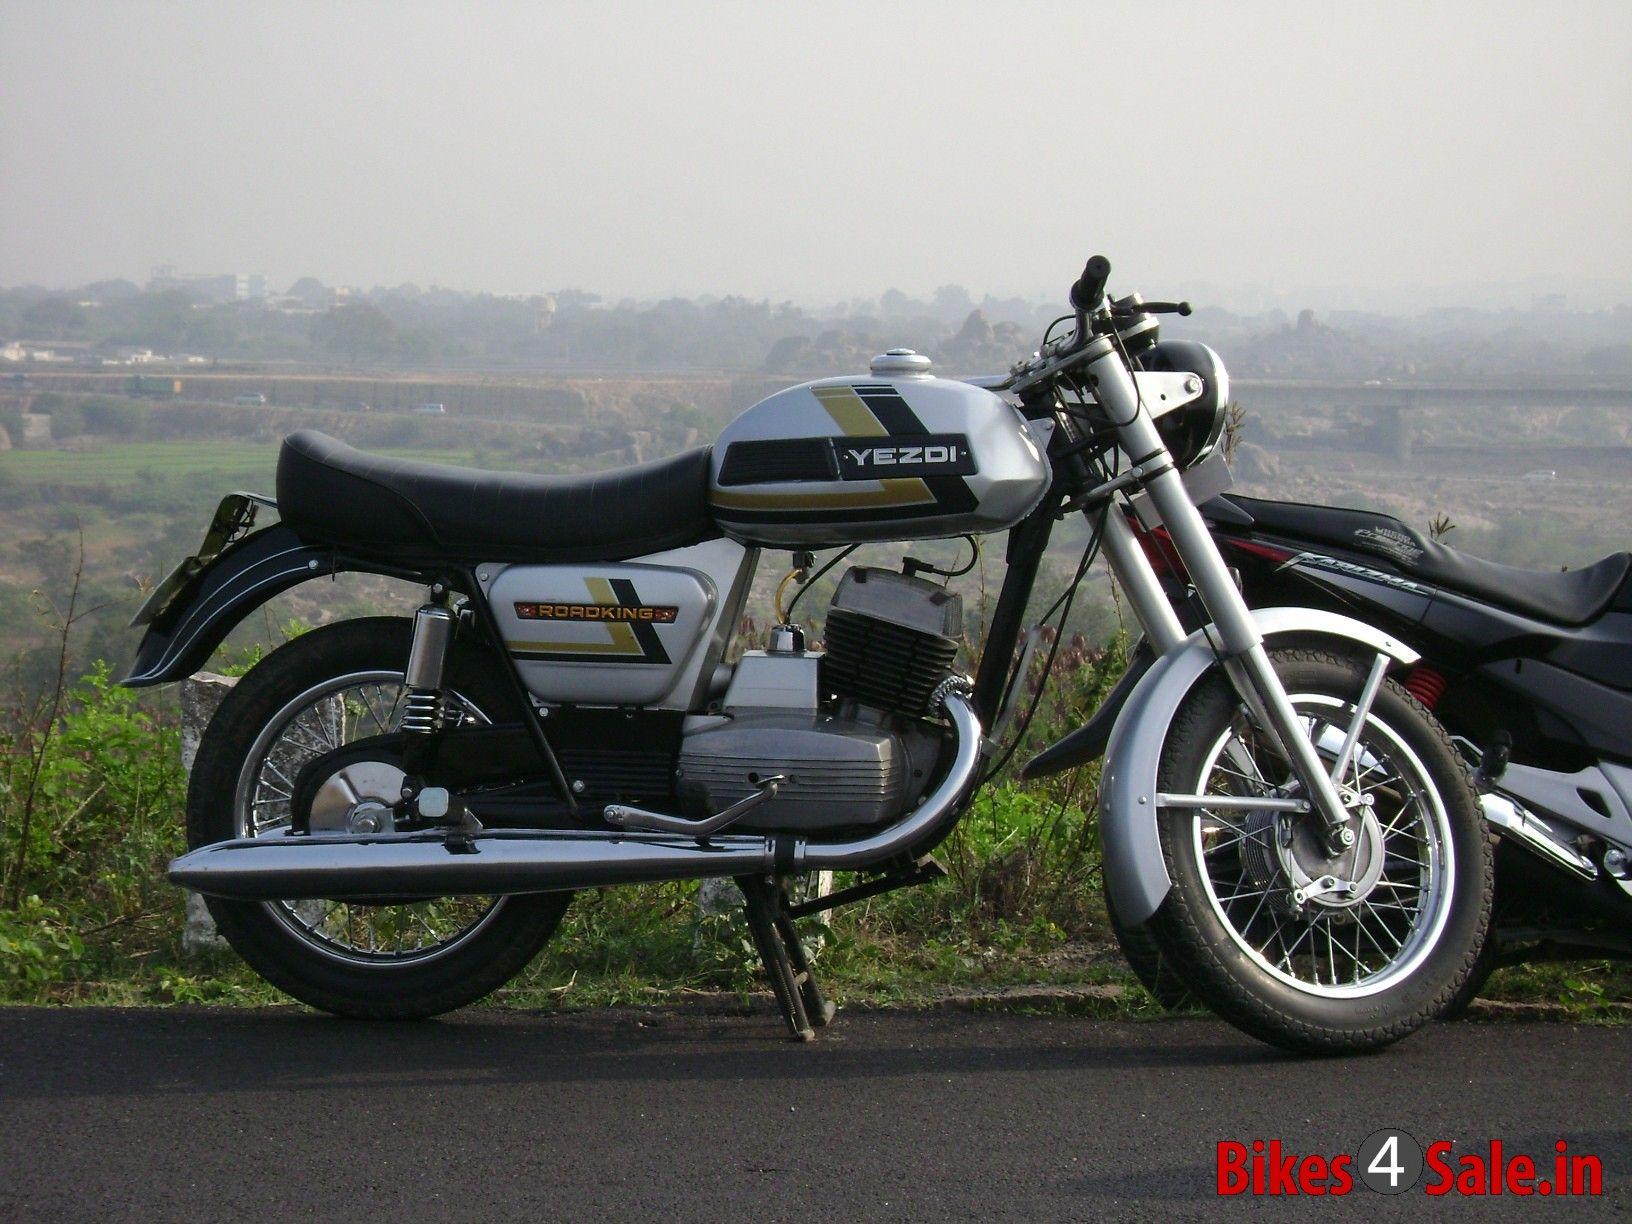 Ideal Jawa Yezdi Roadking Picture 1 Bike Id Is 30692 Motorcycle